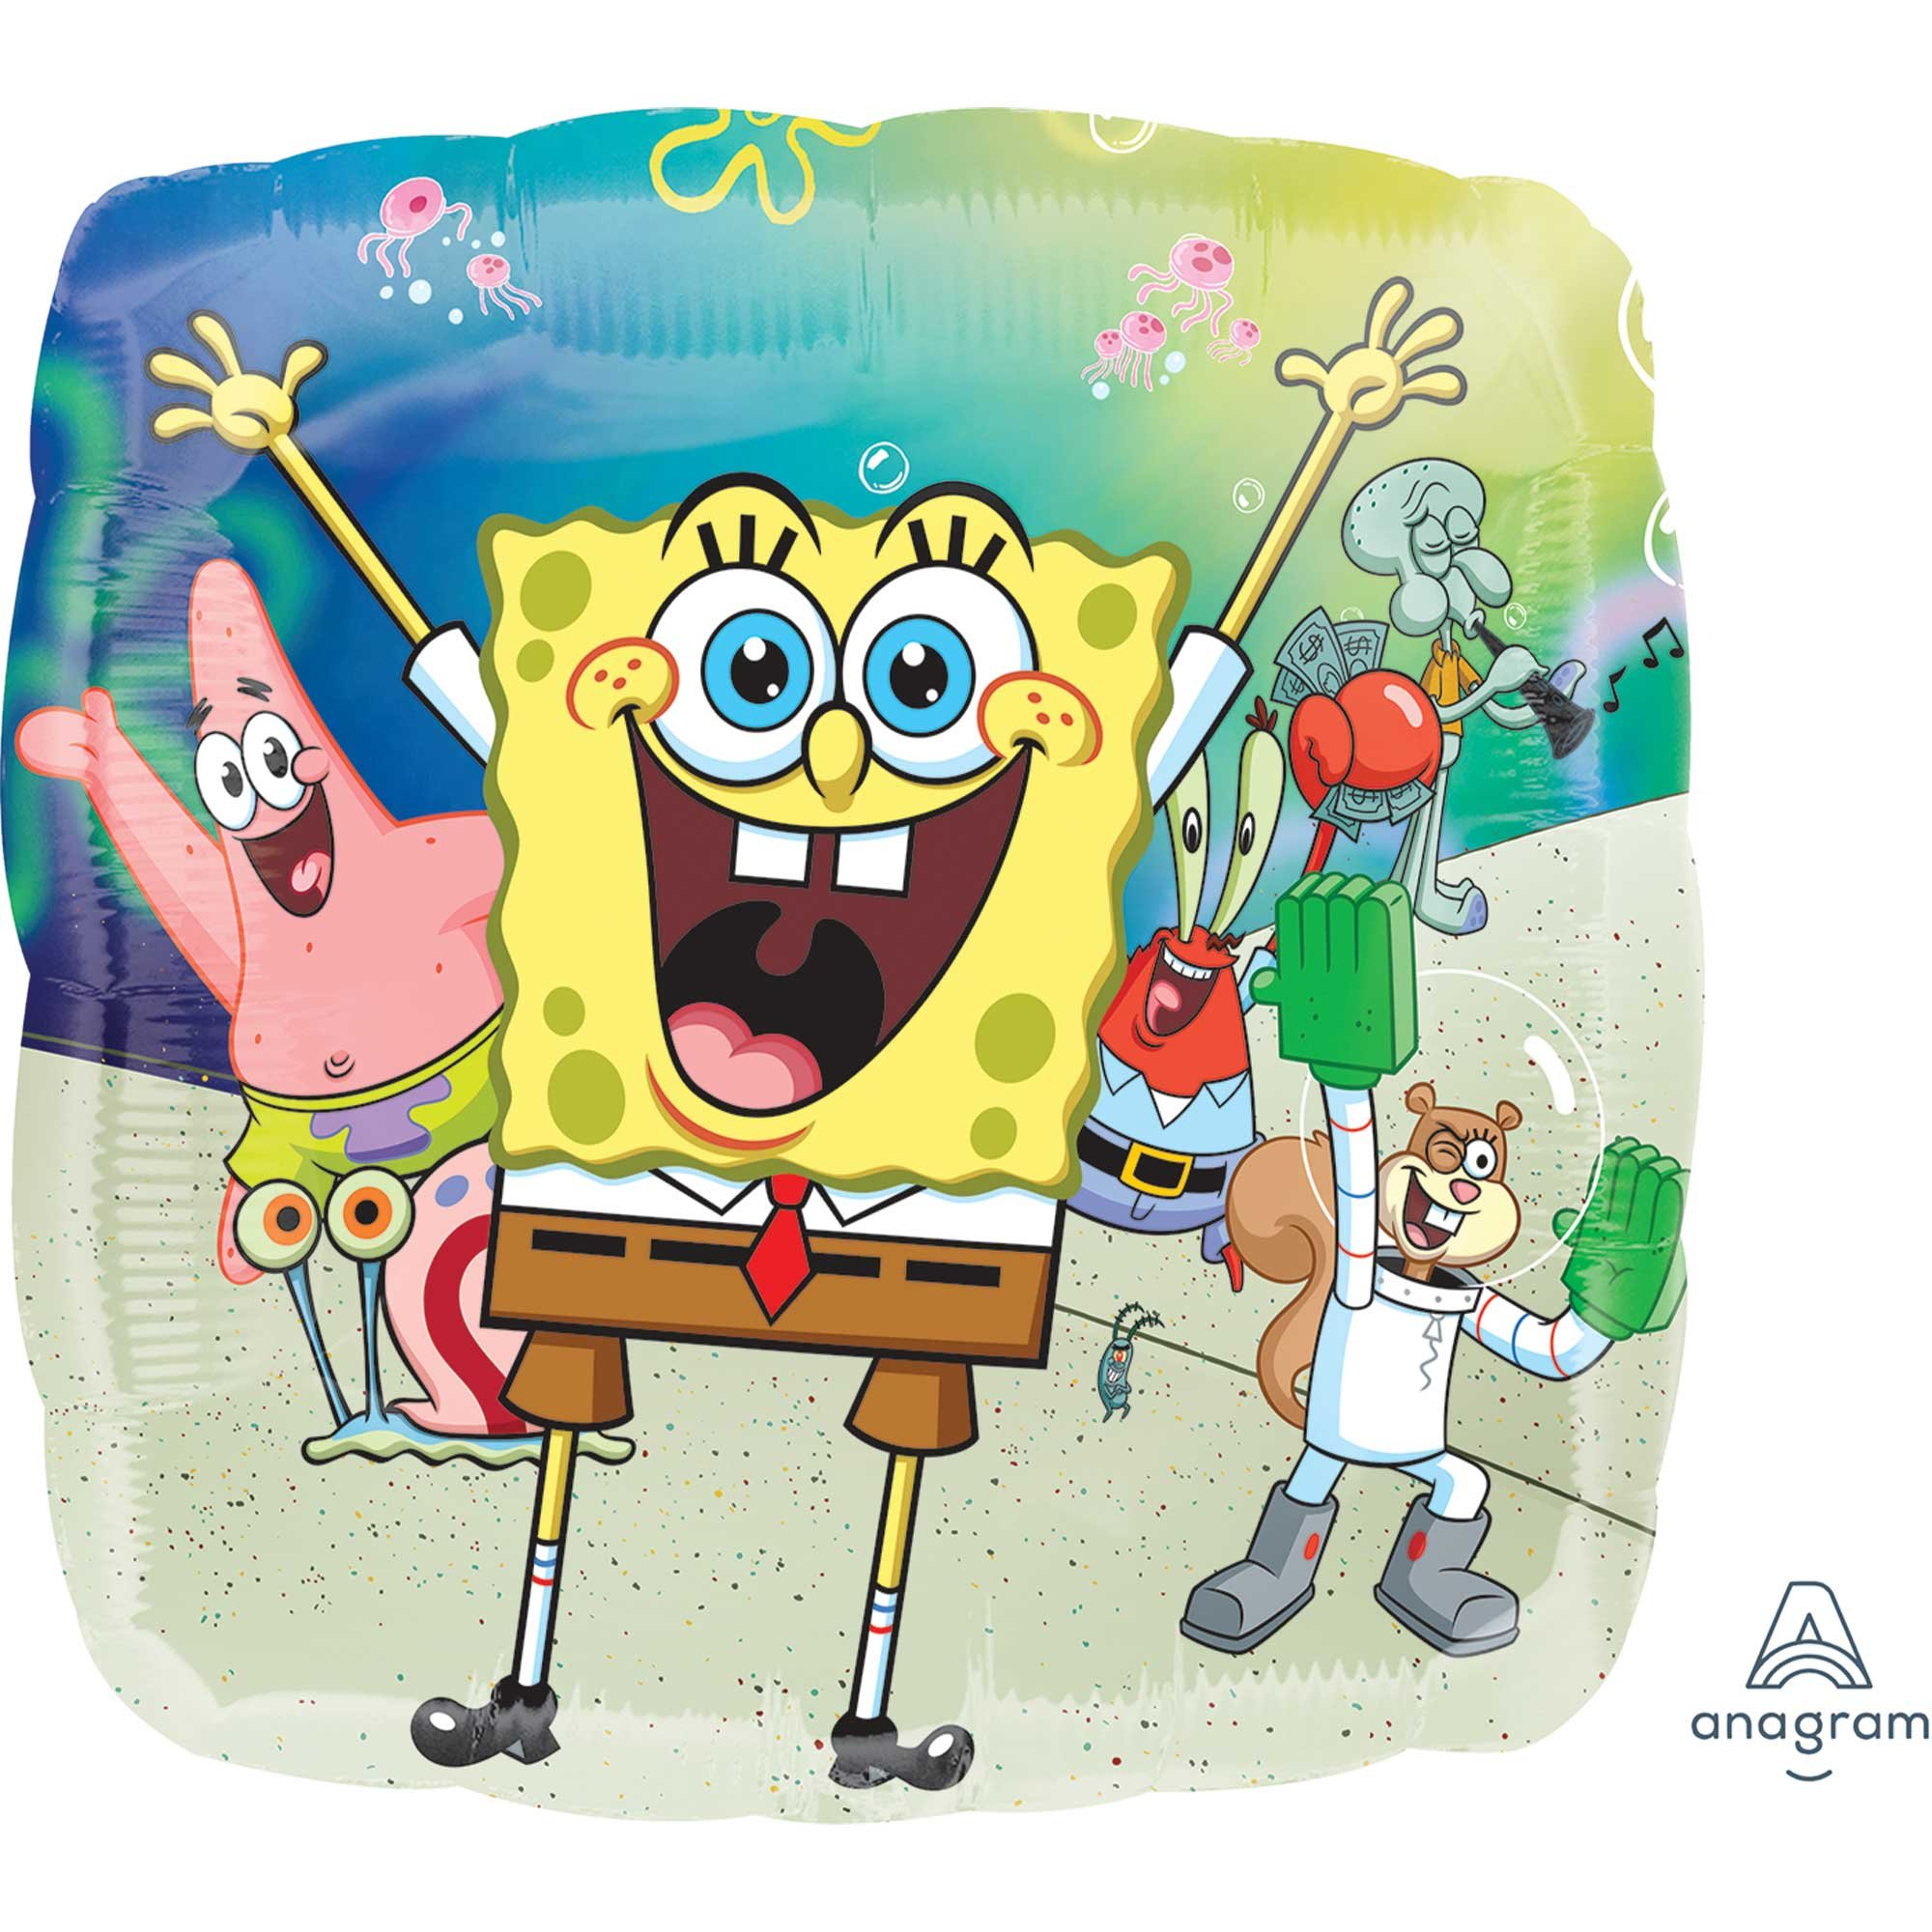 45cm Standard HX SpongeBob Squarepants S60